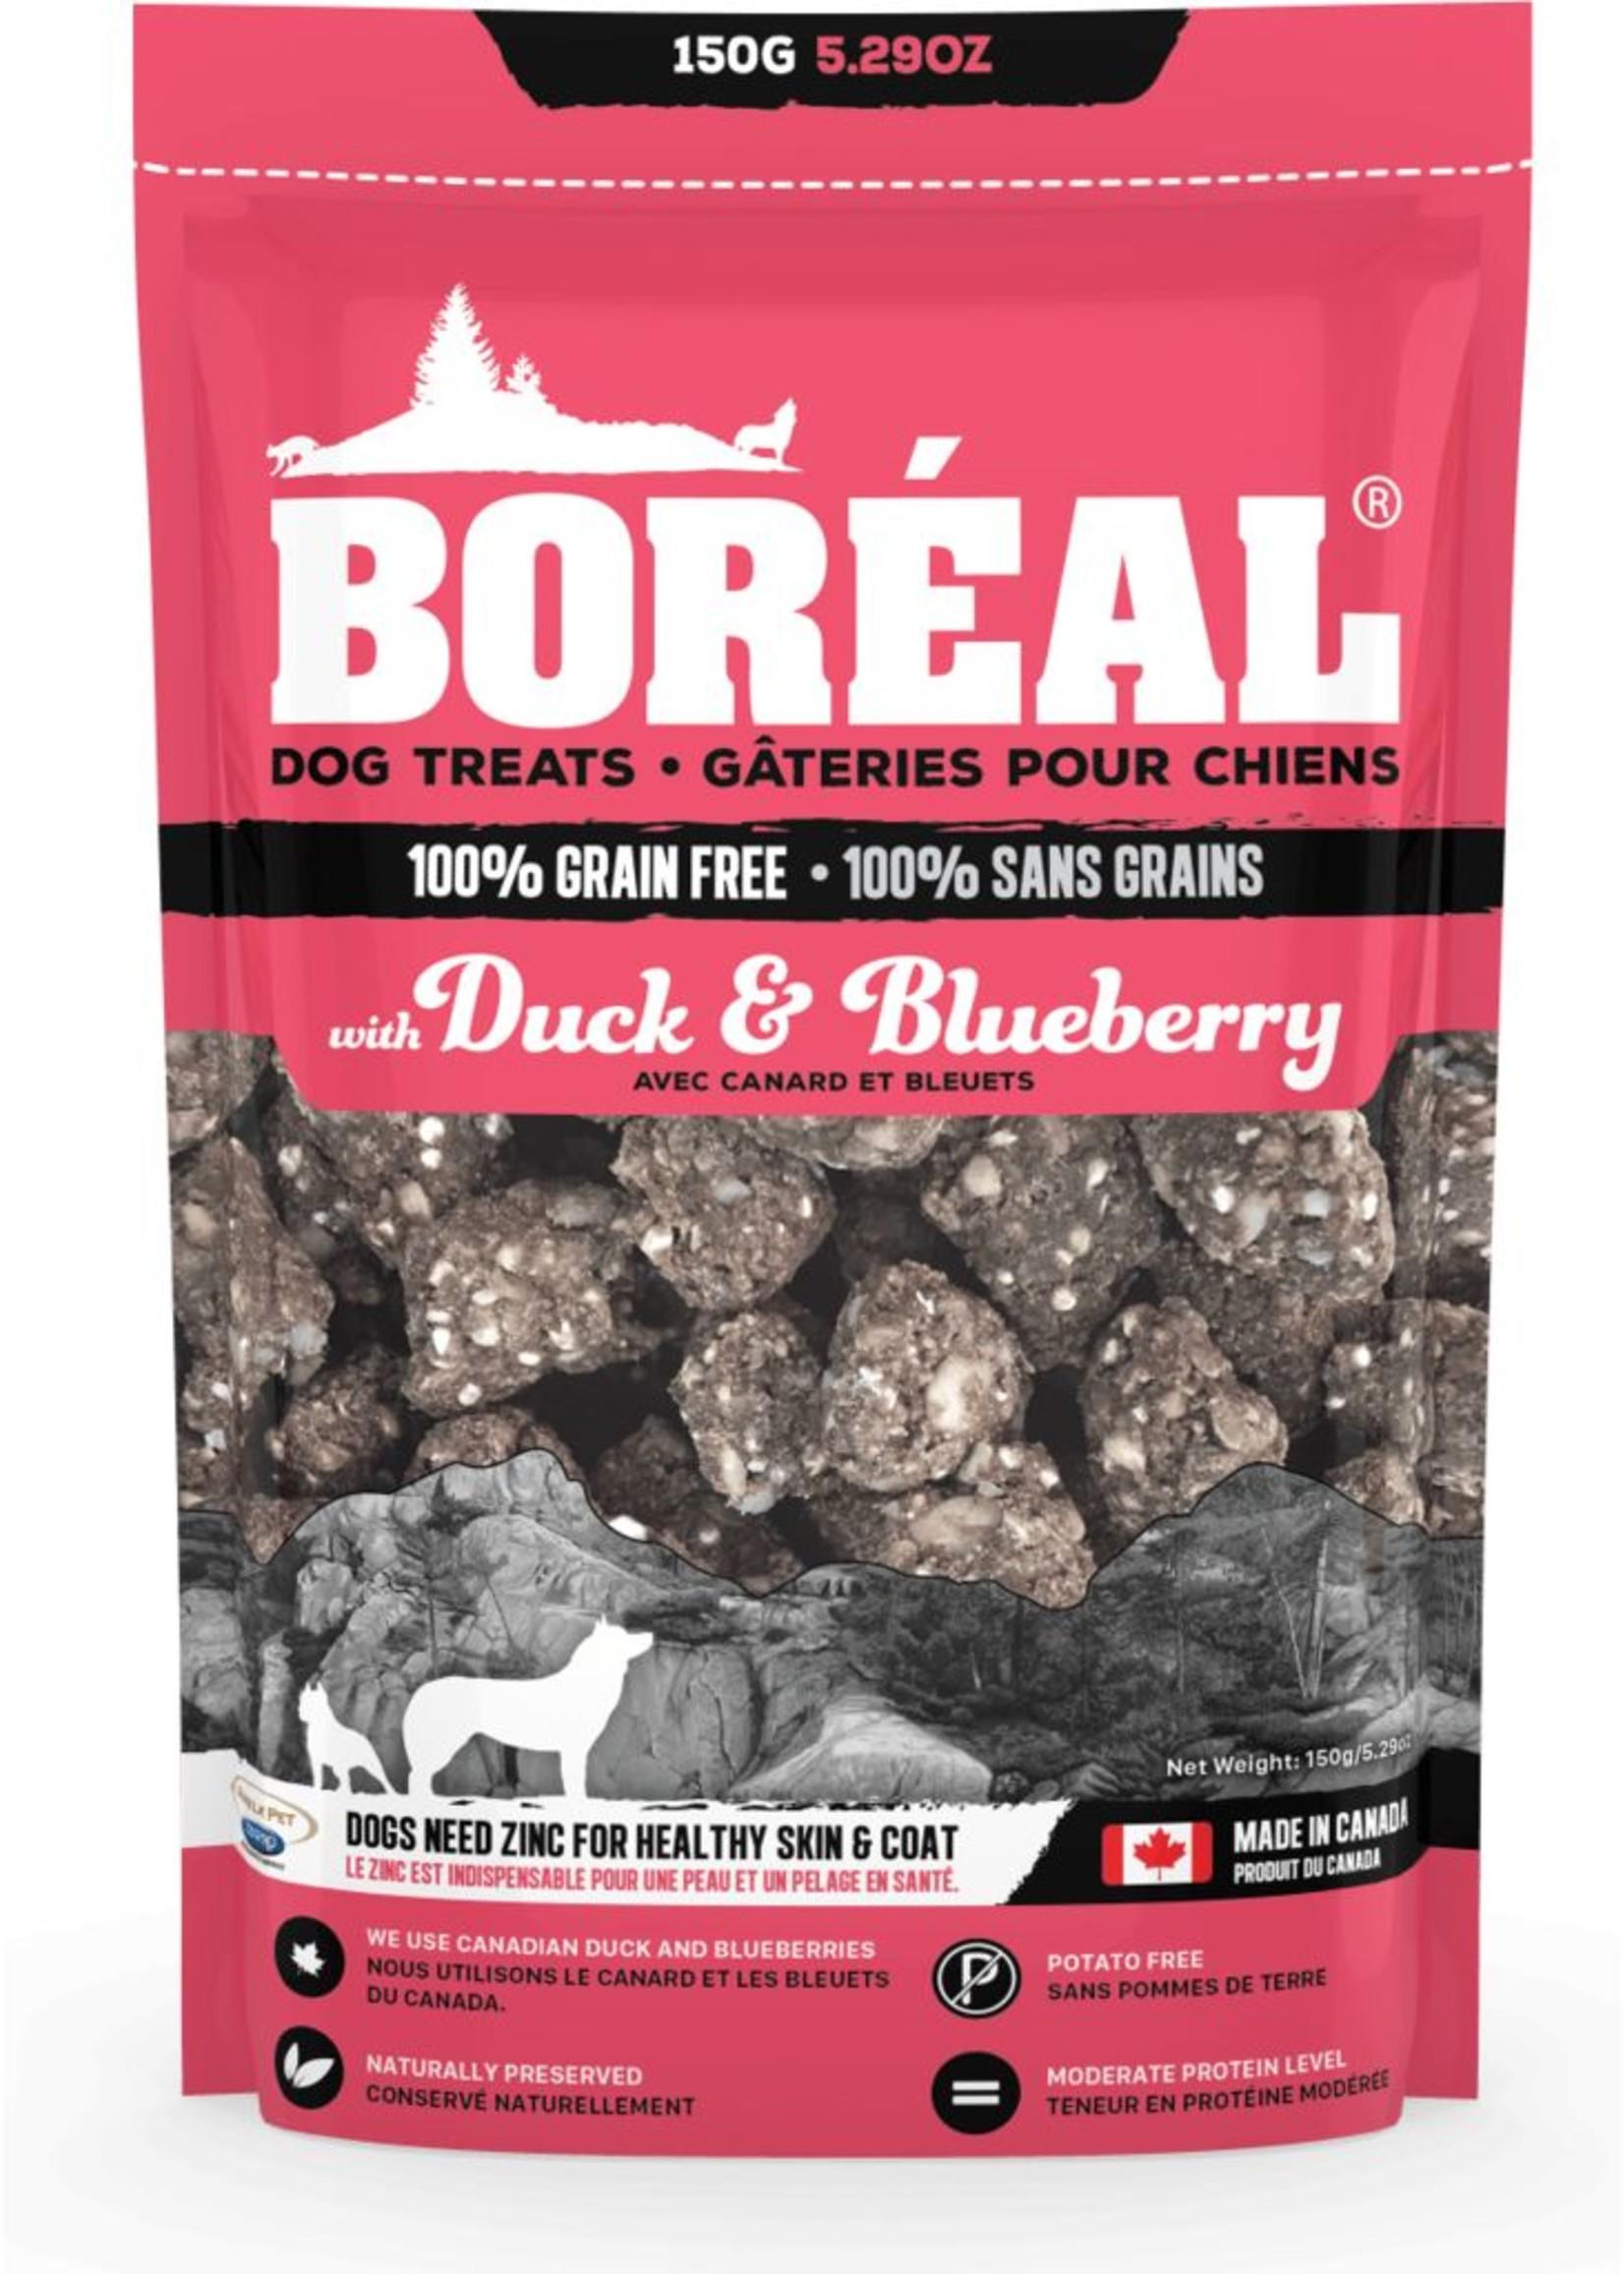 Boreal Dog Treats - Duck & Blueberry 150g